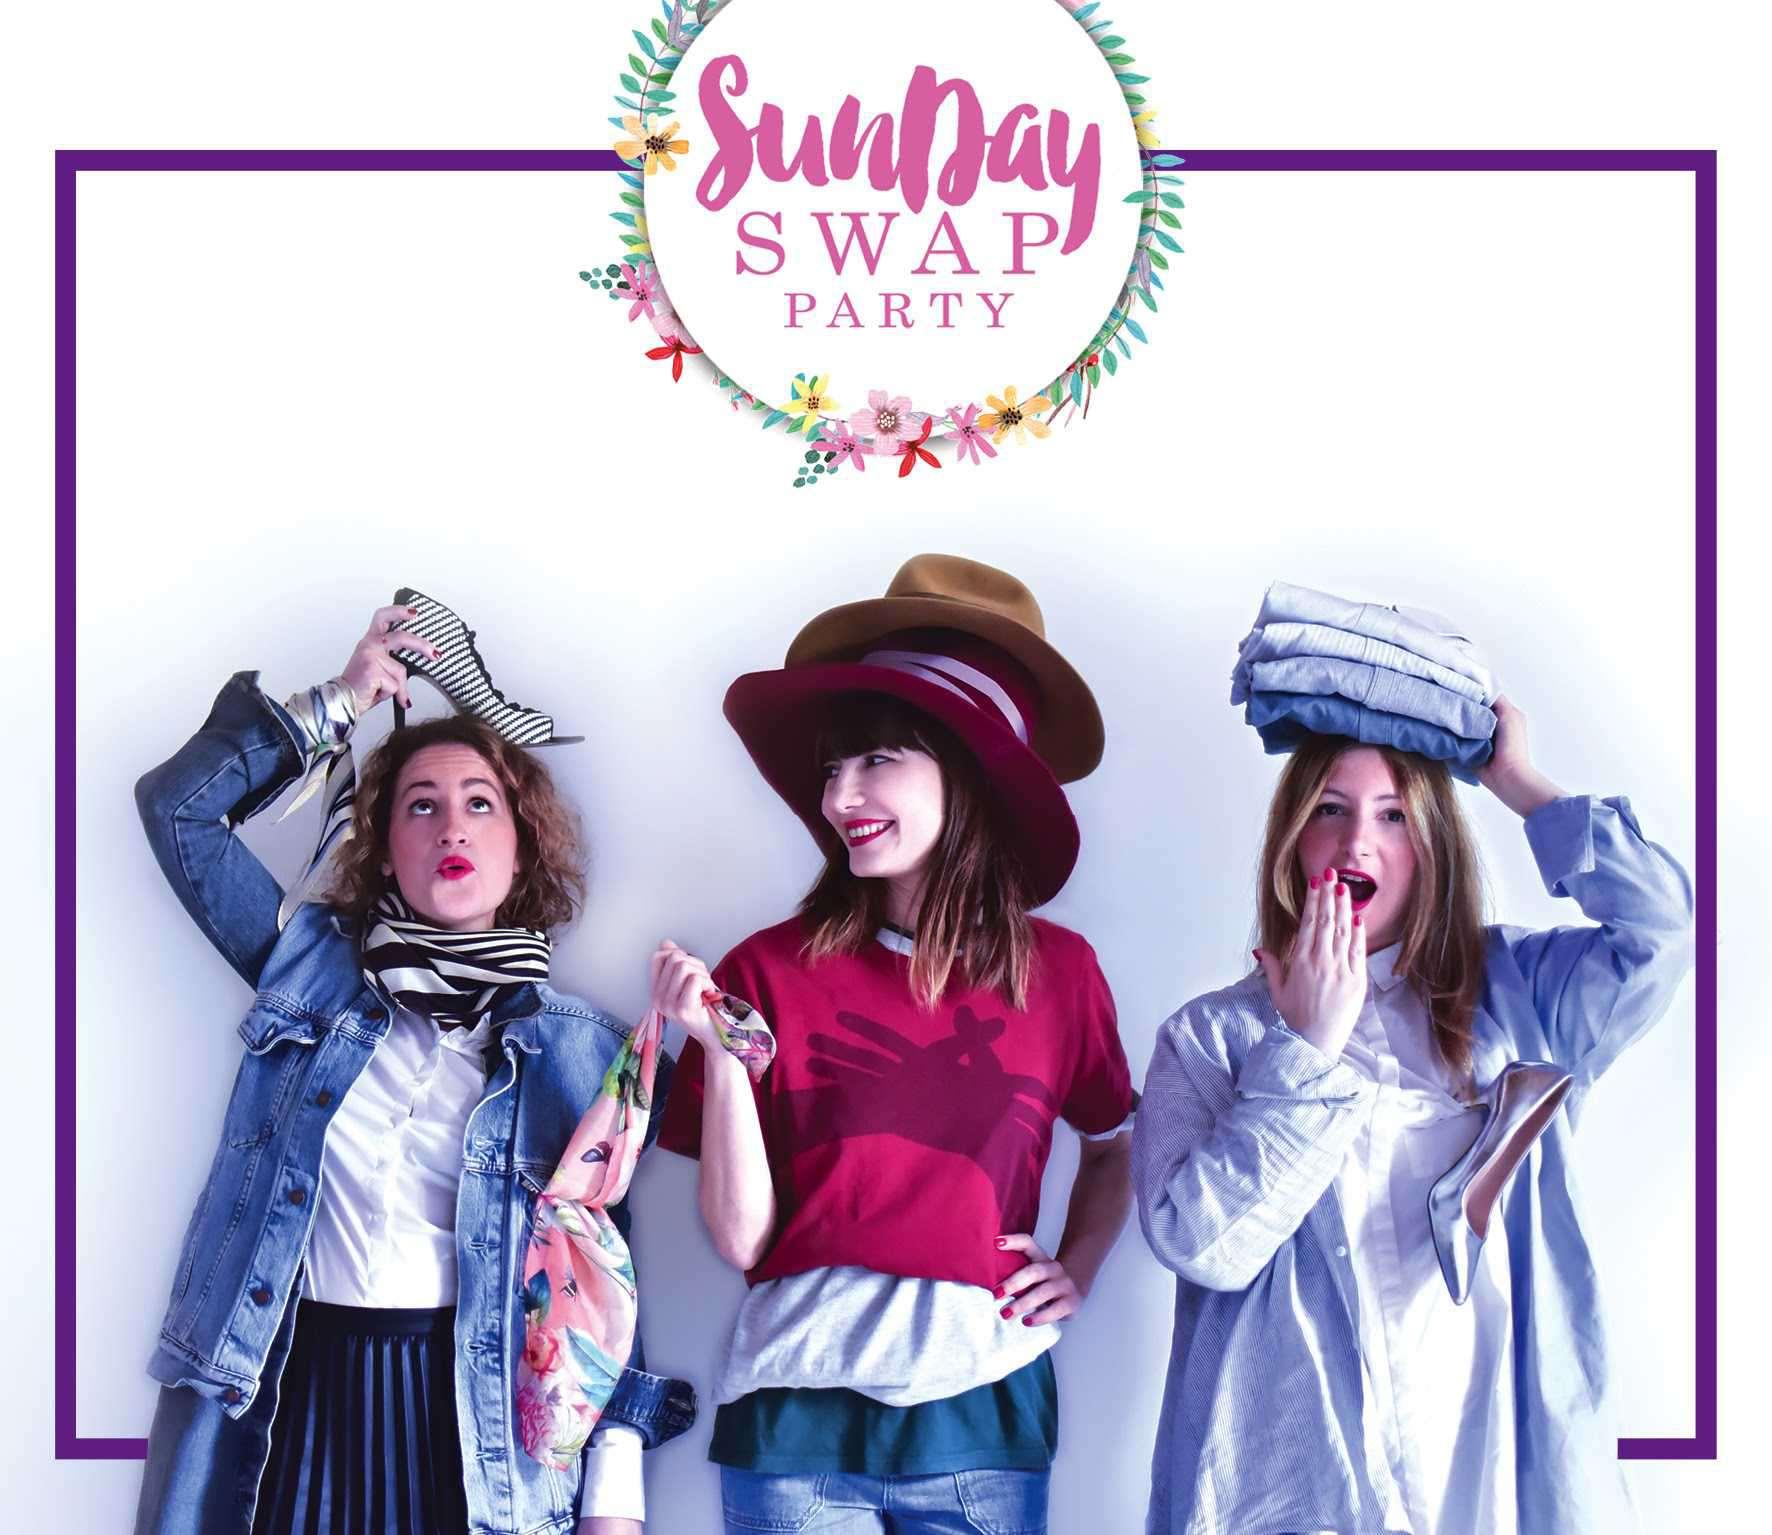 SUNDAY SWAP PARTY